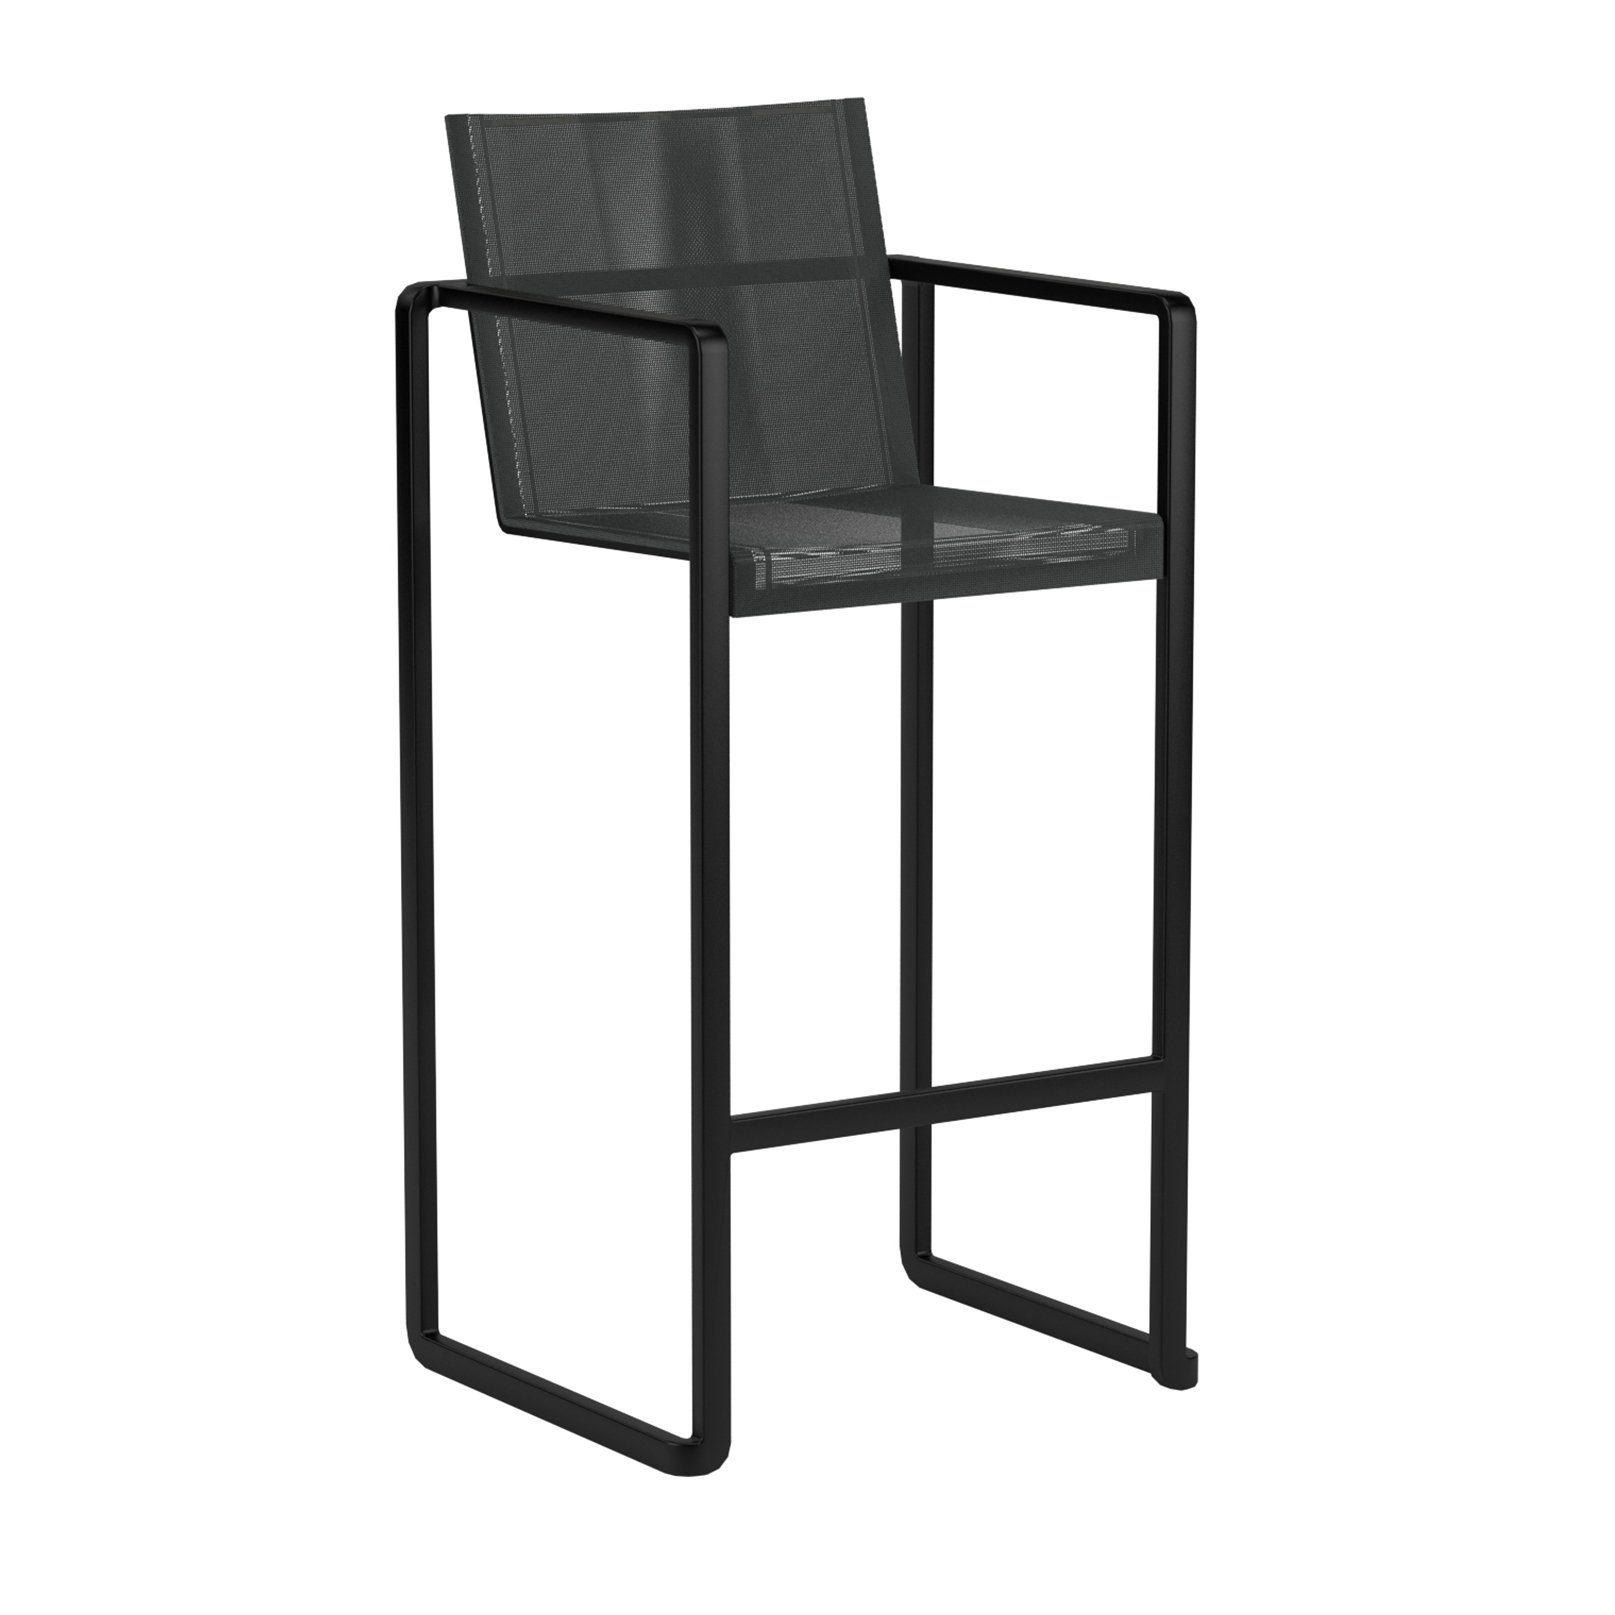 "Royal Botania Barhocker ""Alura"", Gestell Aluminium schwarz, Sitzflächen-Bespannung Textilgewebe schwarz"